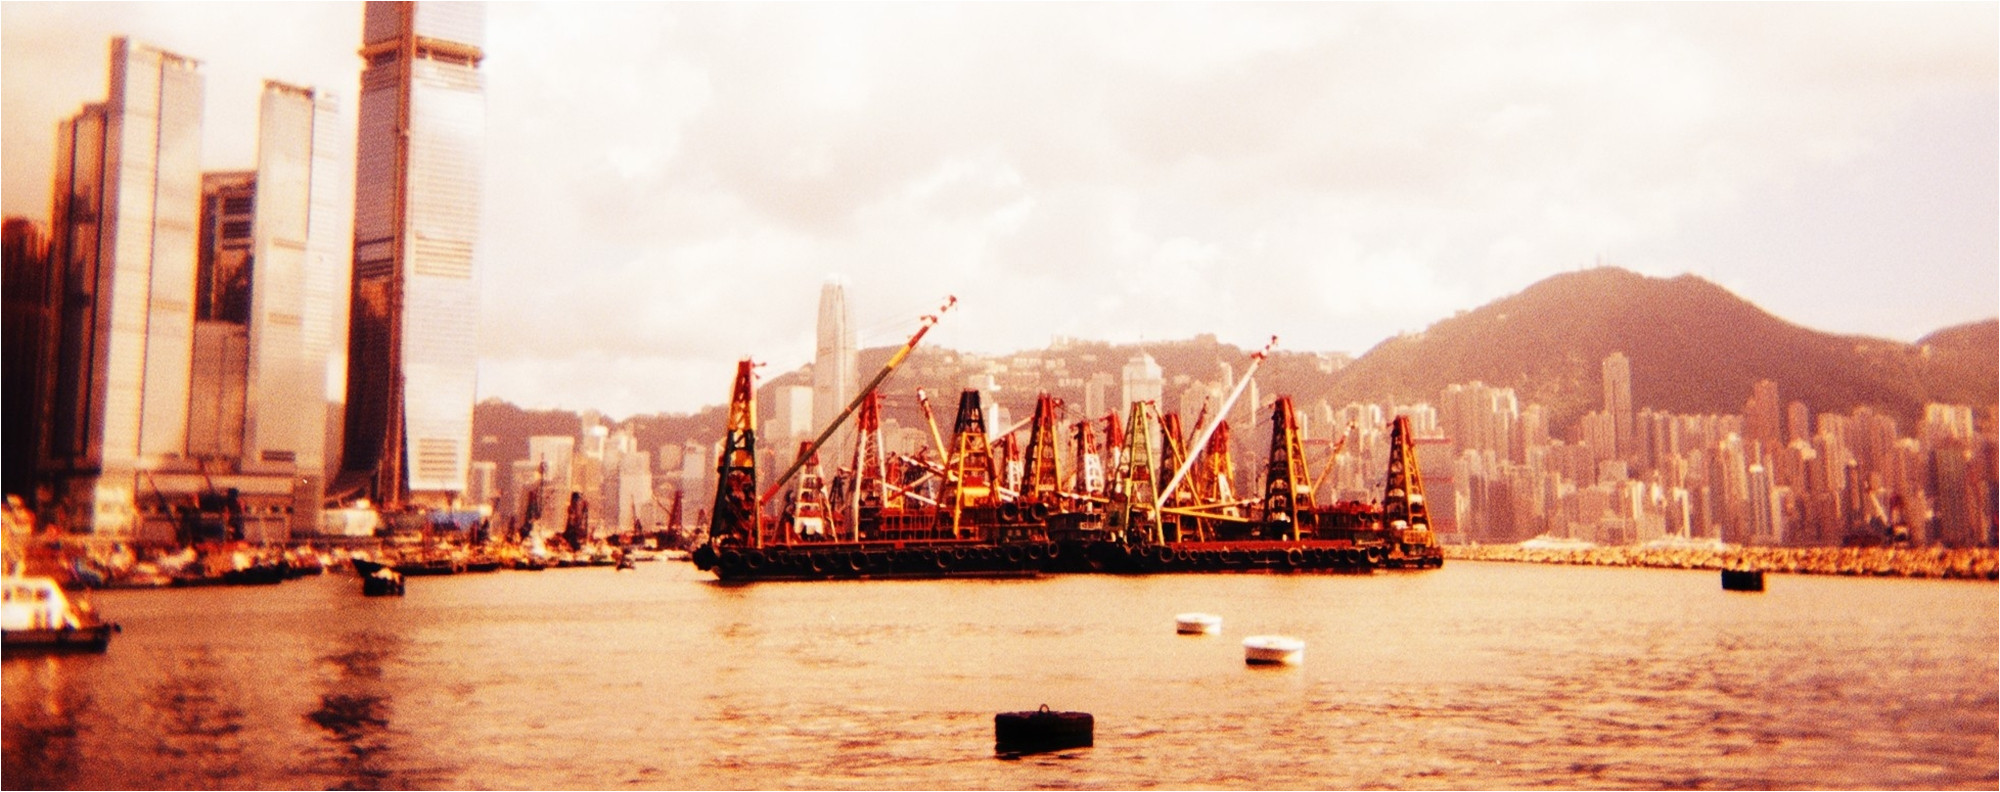 victoria harbour shot using a holga camera picture justin lim